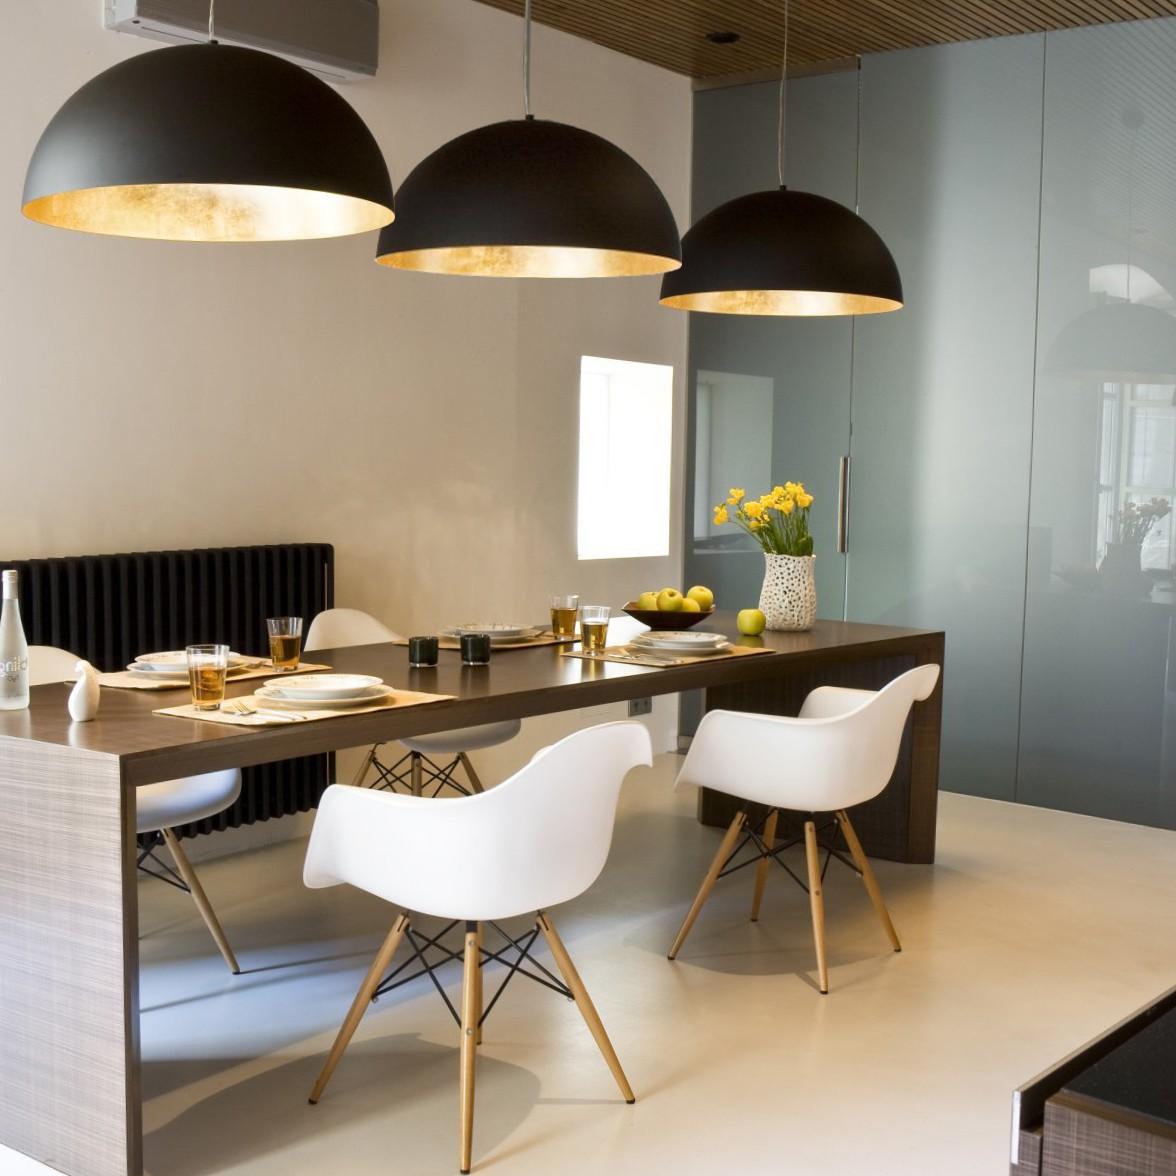 s luce blister pendelleuchte 55 cm schwarz gold esstischlampe h ngeleuchte kaufen bei. Black Bedroom Furniture Sets. Home Design Ideas